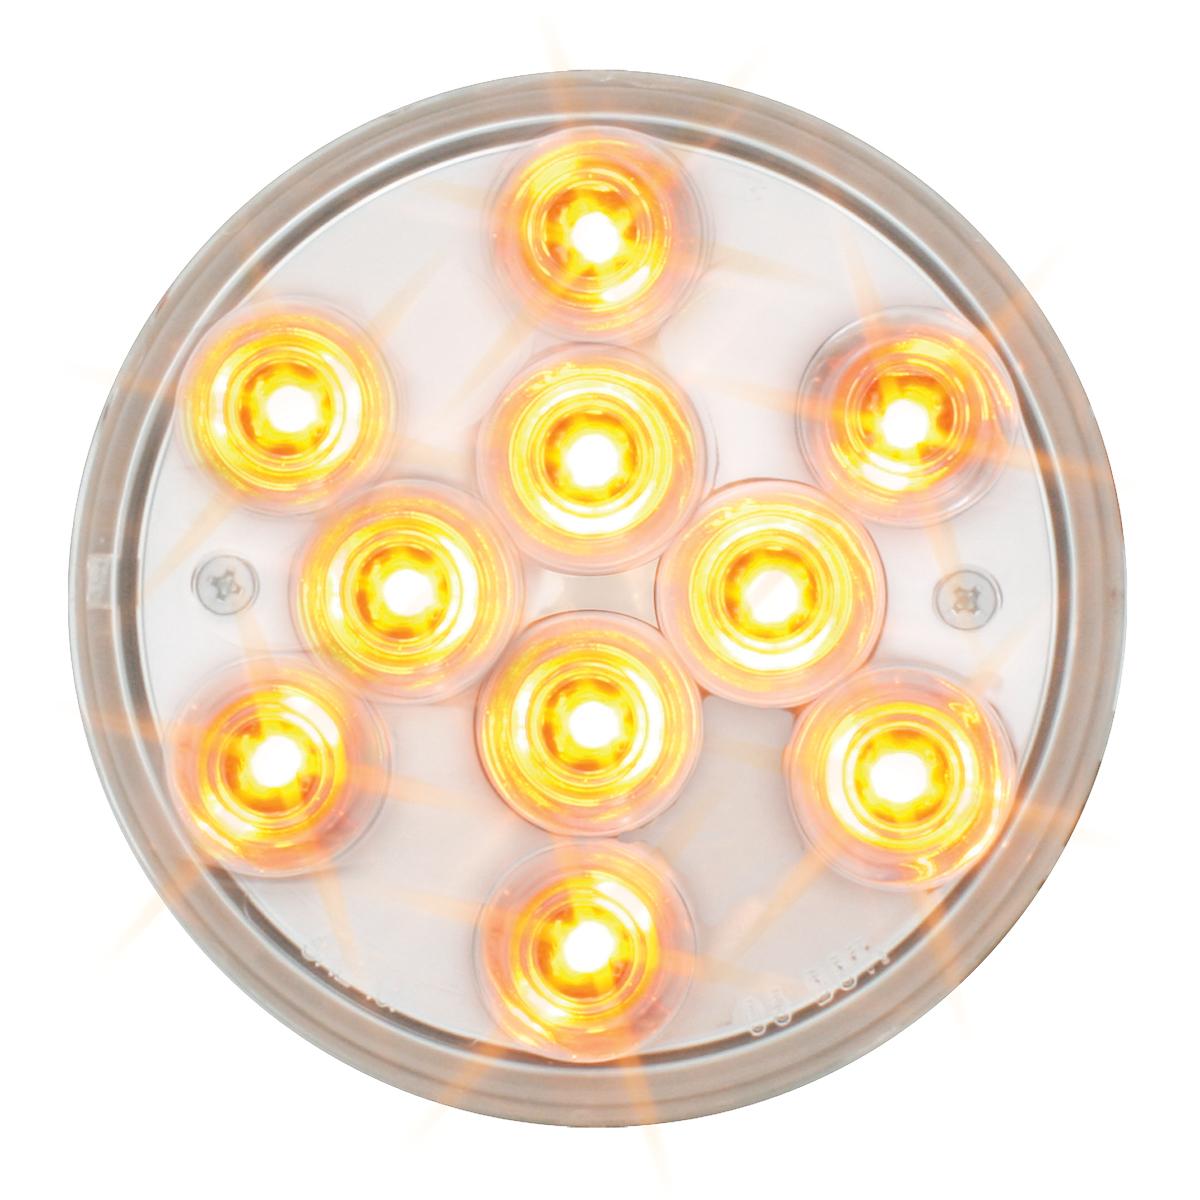 "76841 4"" Mega 10 Plus LED Light in Amber/Clear"